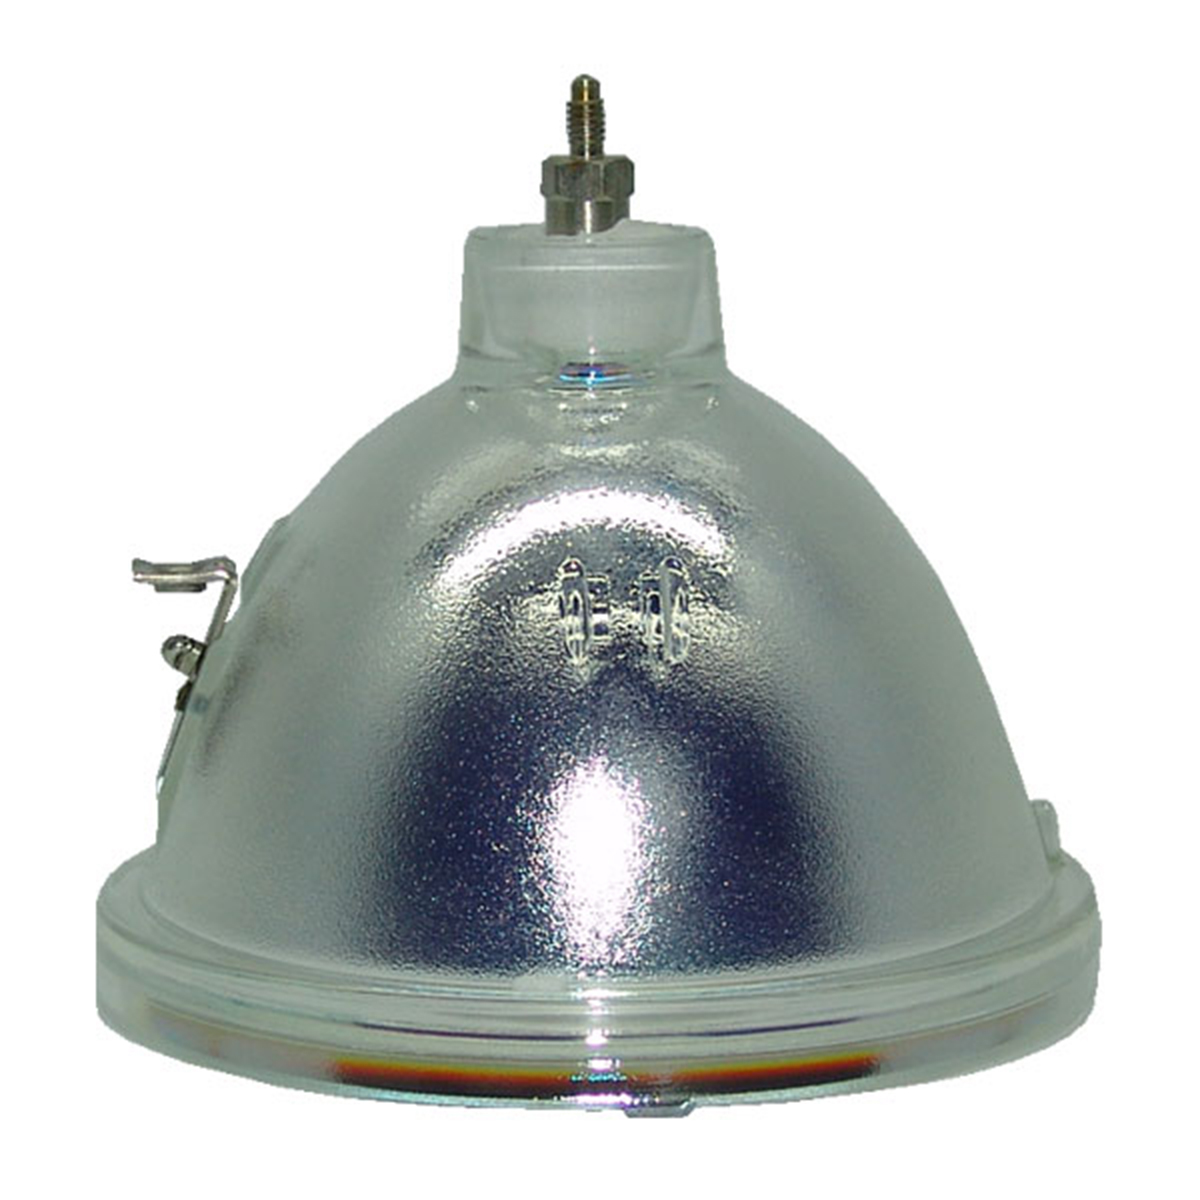 Lutema Platinum for Loewe Articos 55HD TV Lamp (Original Philips Bulb) - image 2 of 5